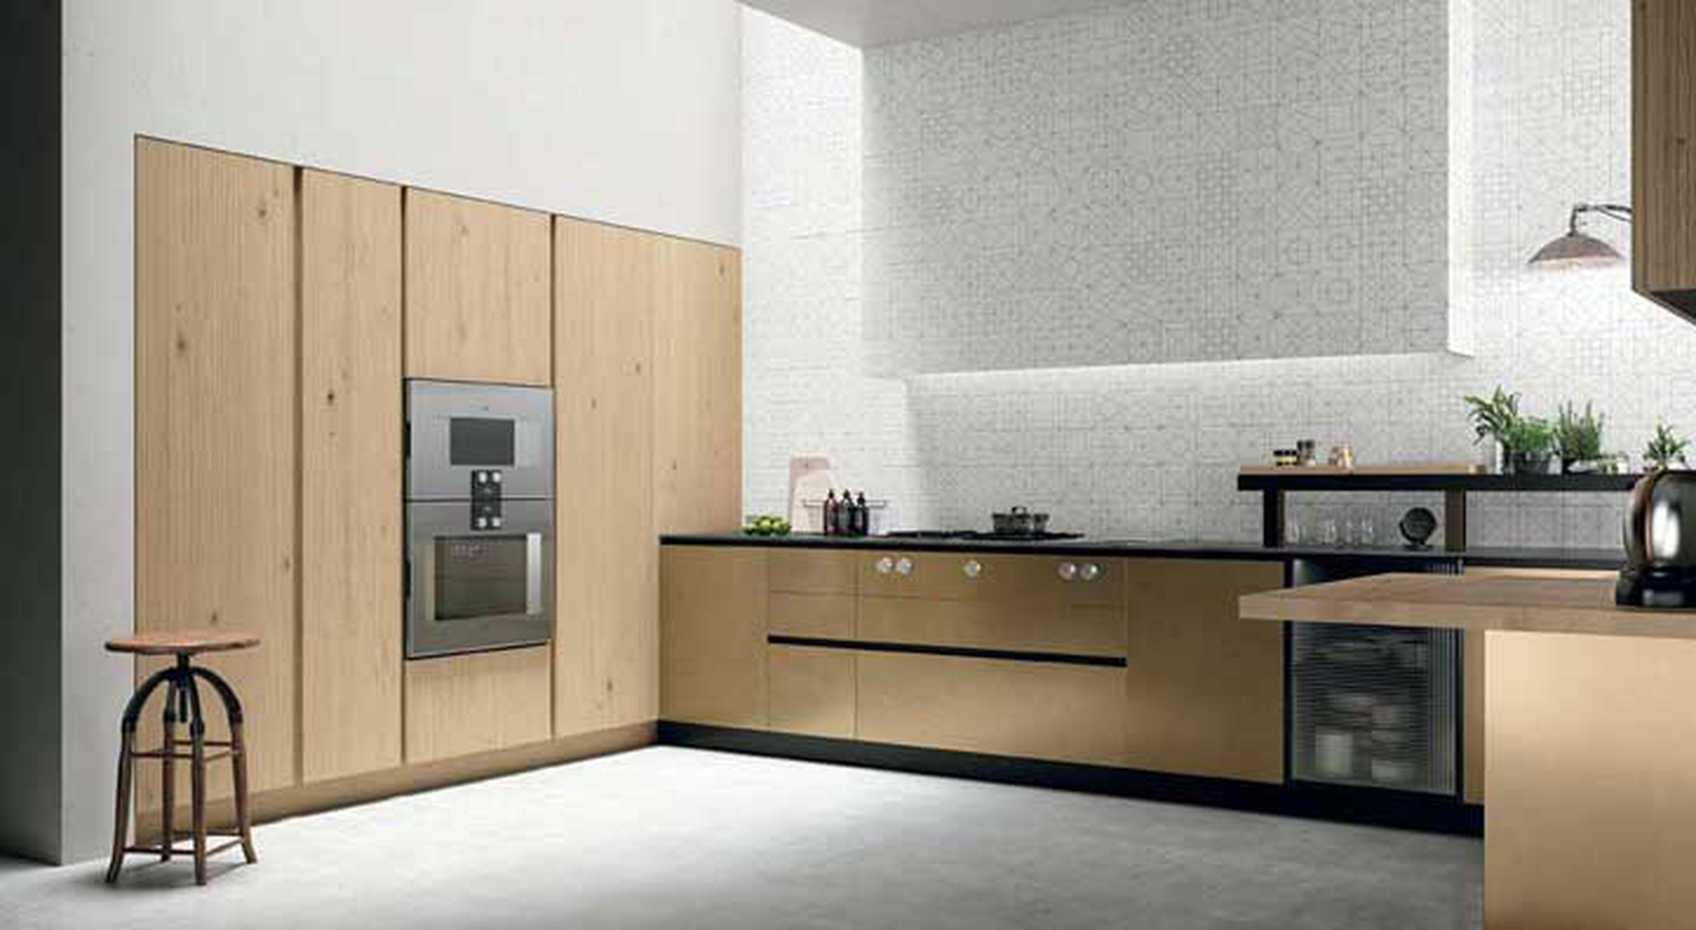 SoHo by Doimo Cucine product image 5